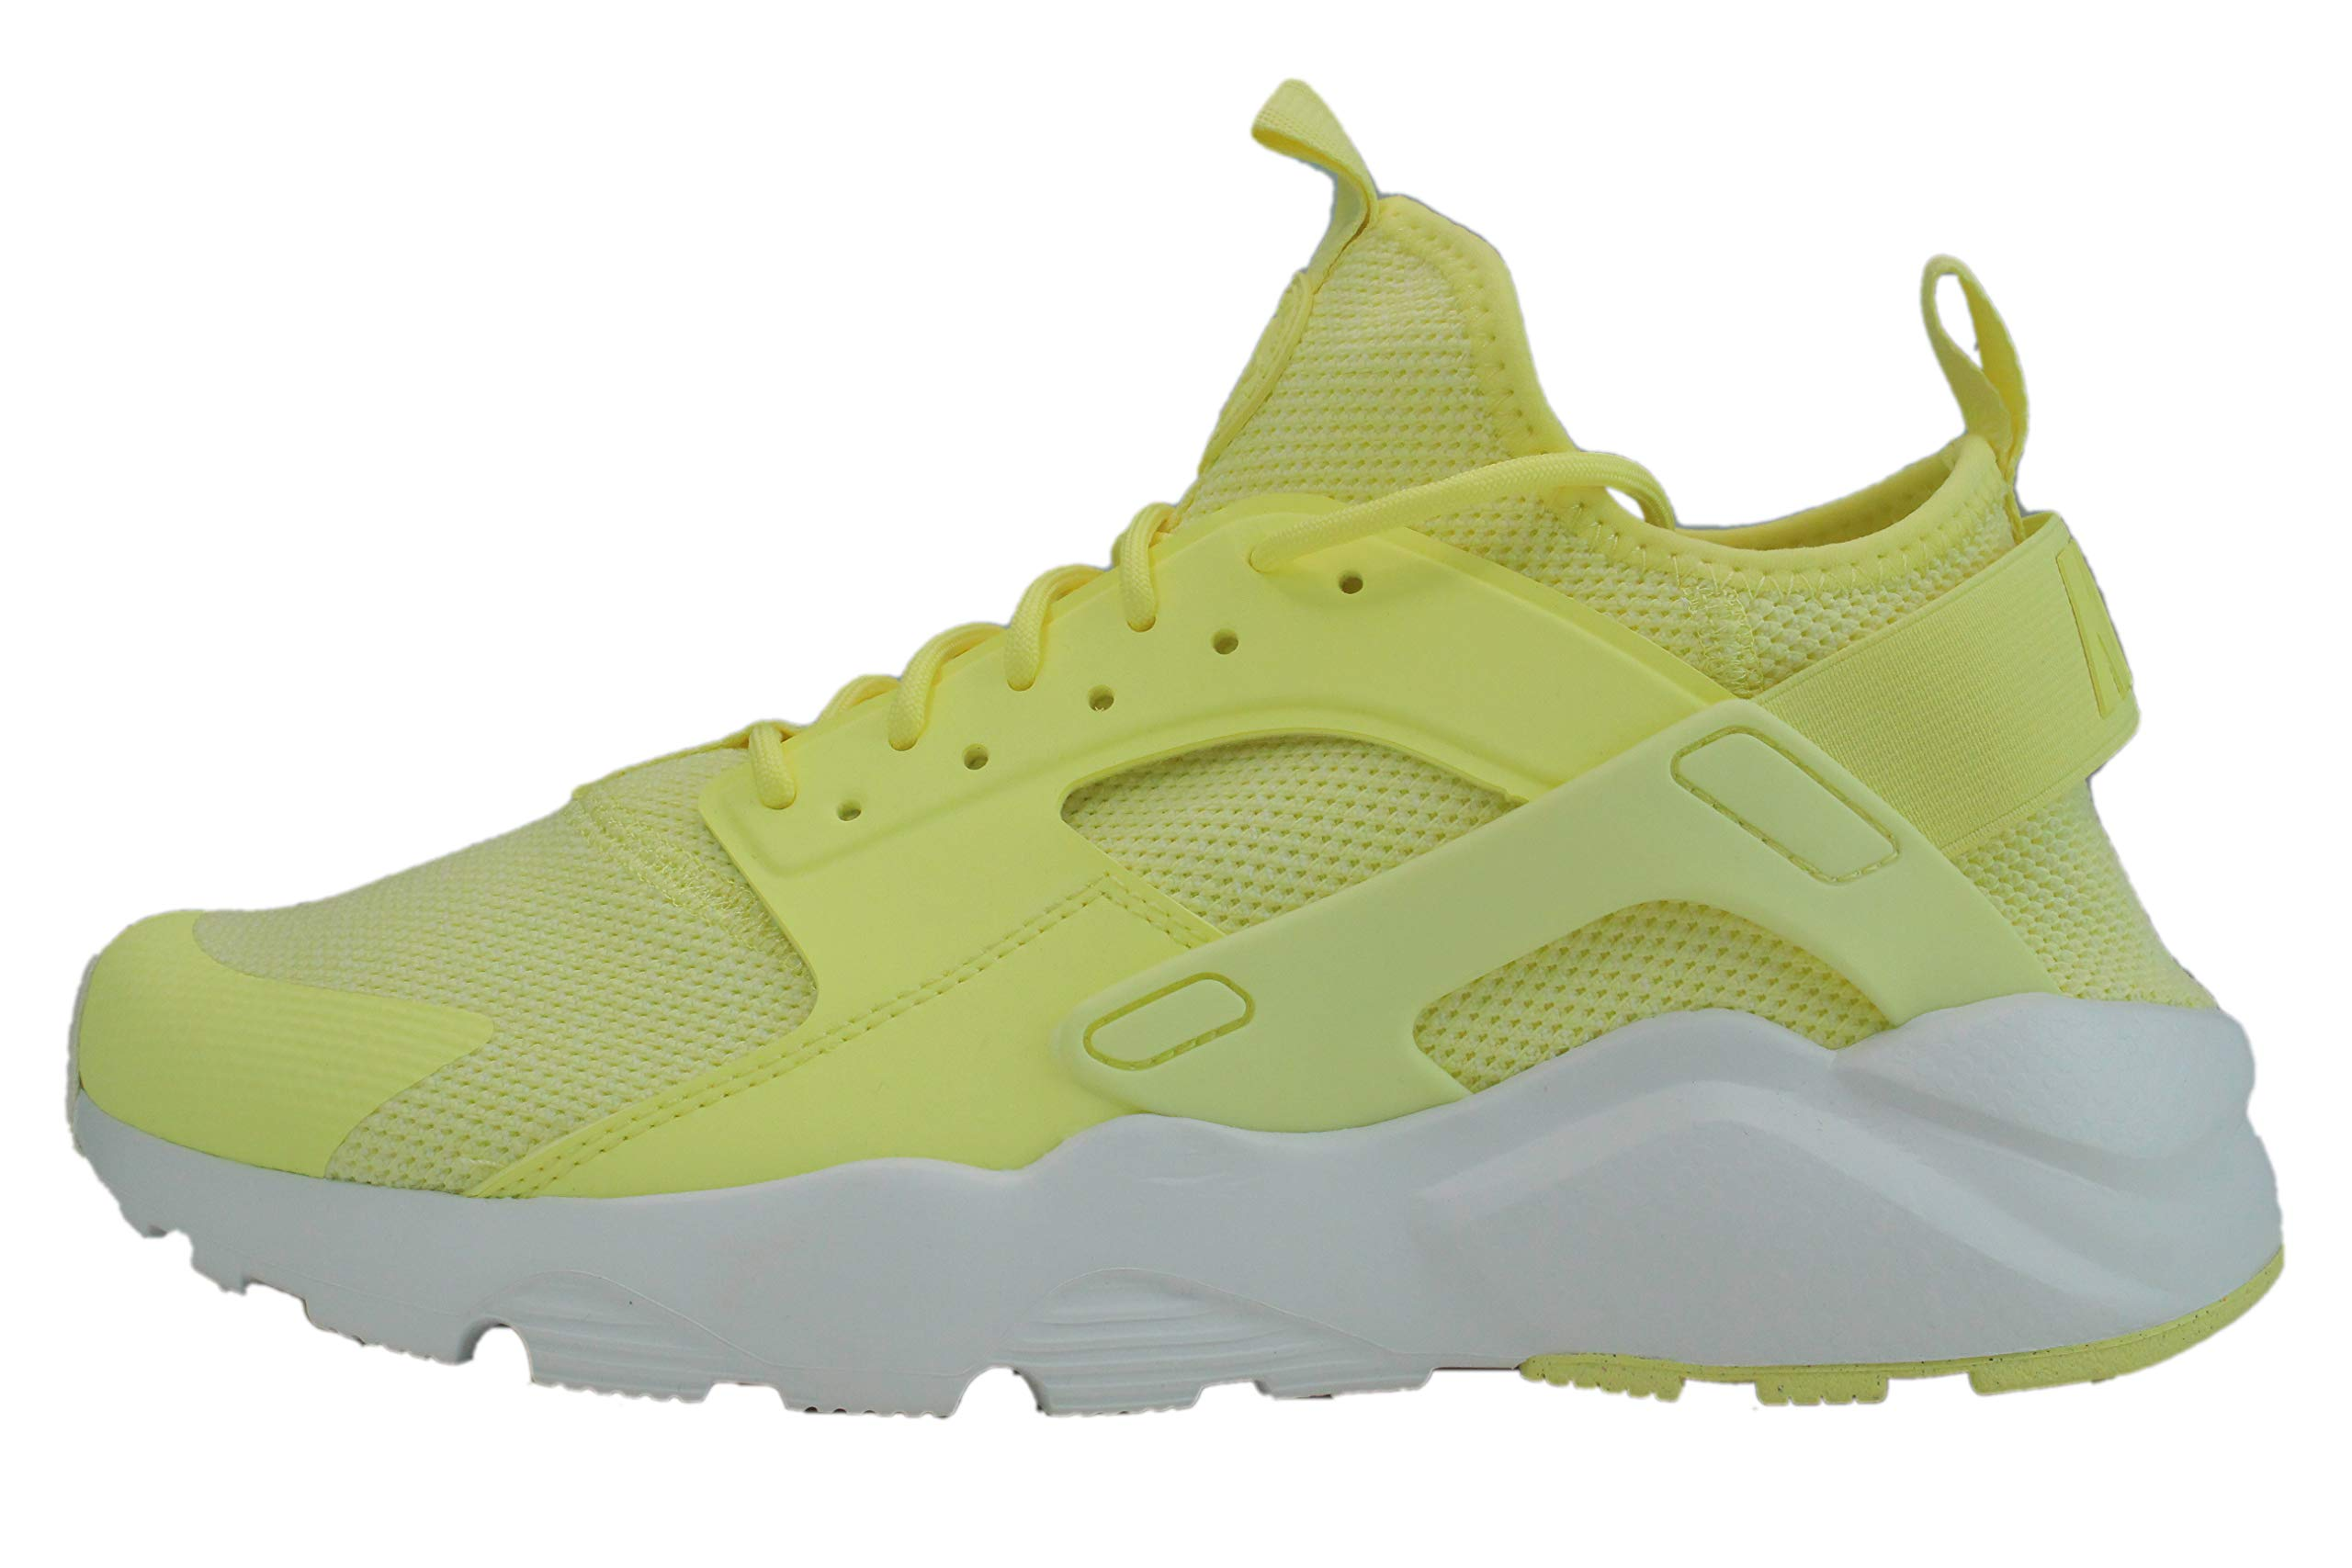 8649753d4d78 Nike Air Huarache Run Ultra BR Men Size 10.5 Lemon Chiffon New Rare